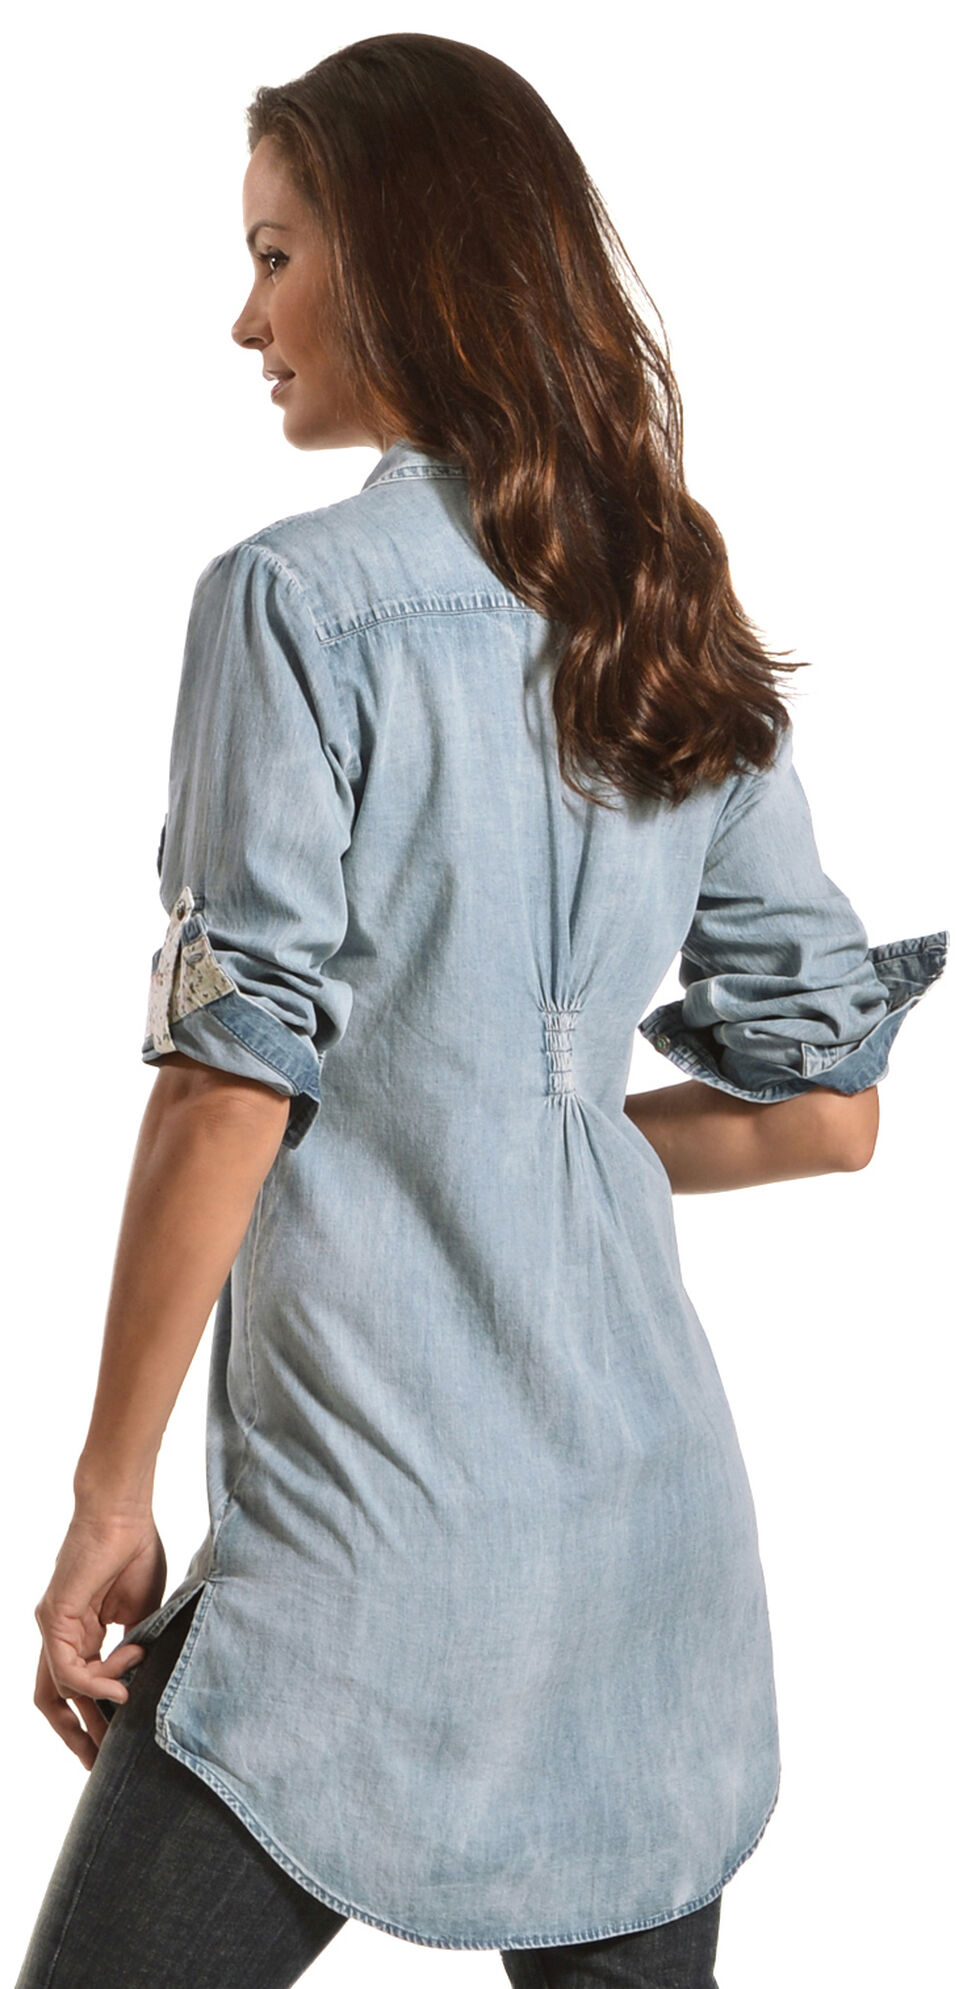 Tasha Polizzi Women's Settler Tunic, Denim, hi-res